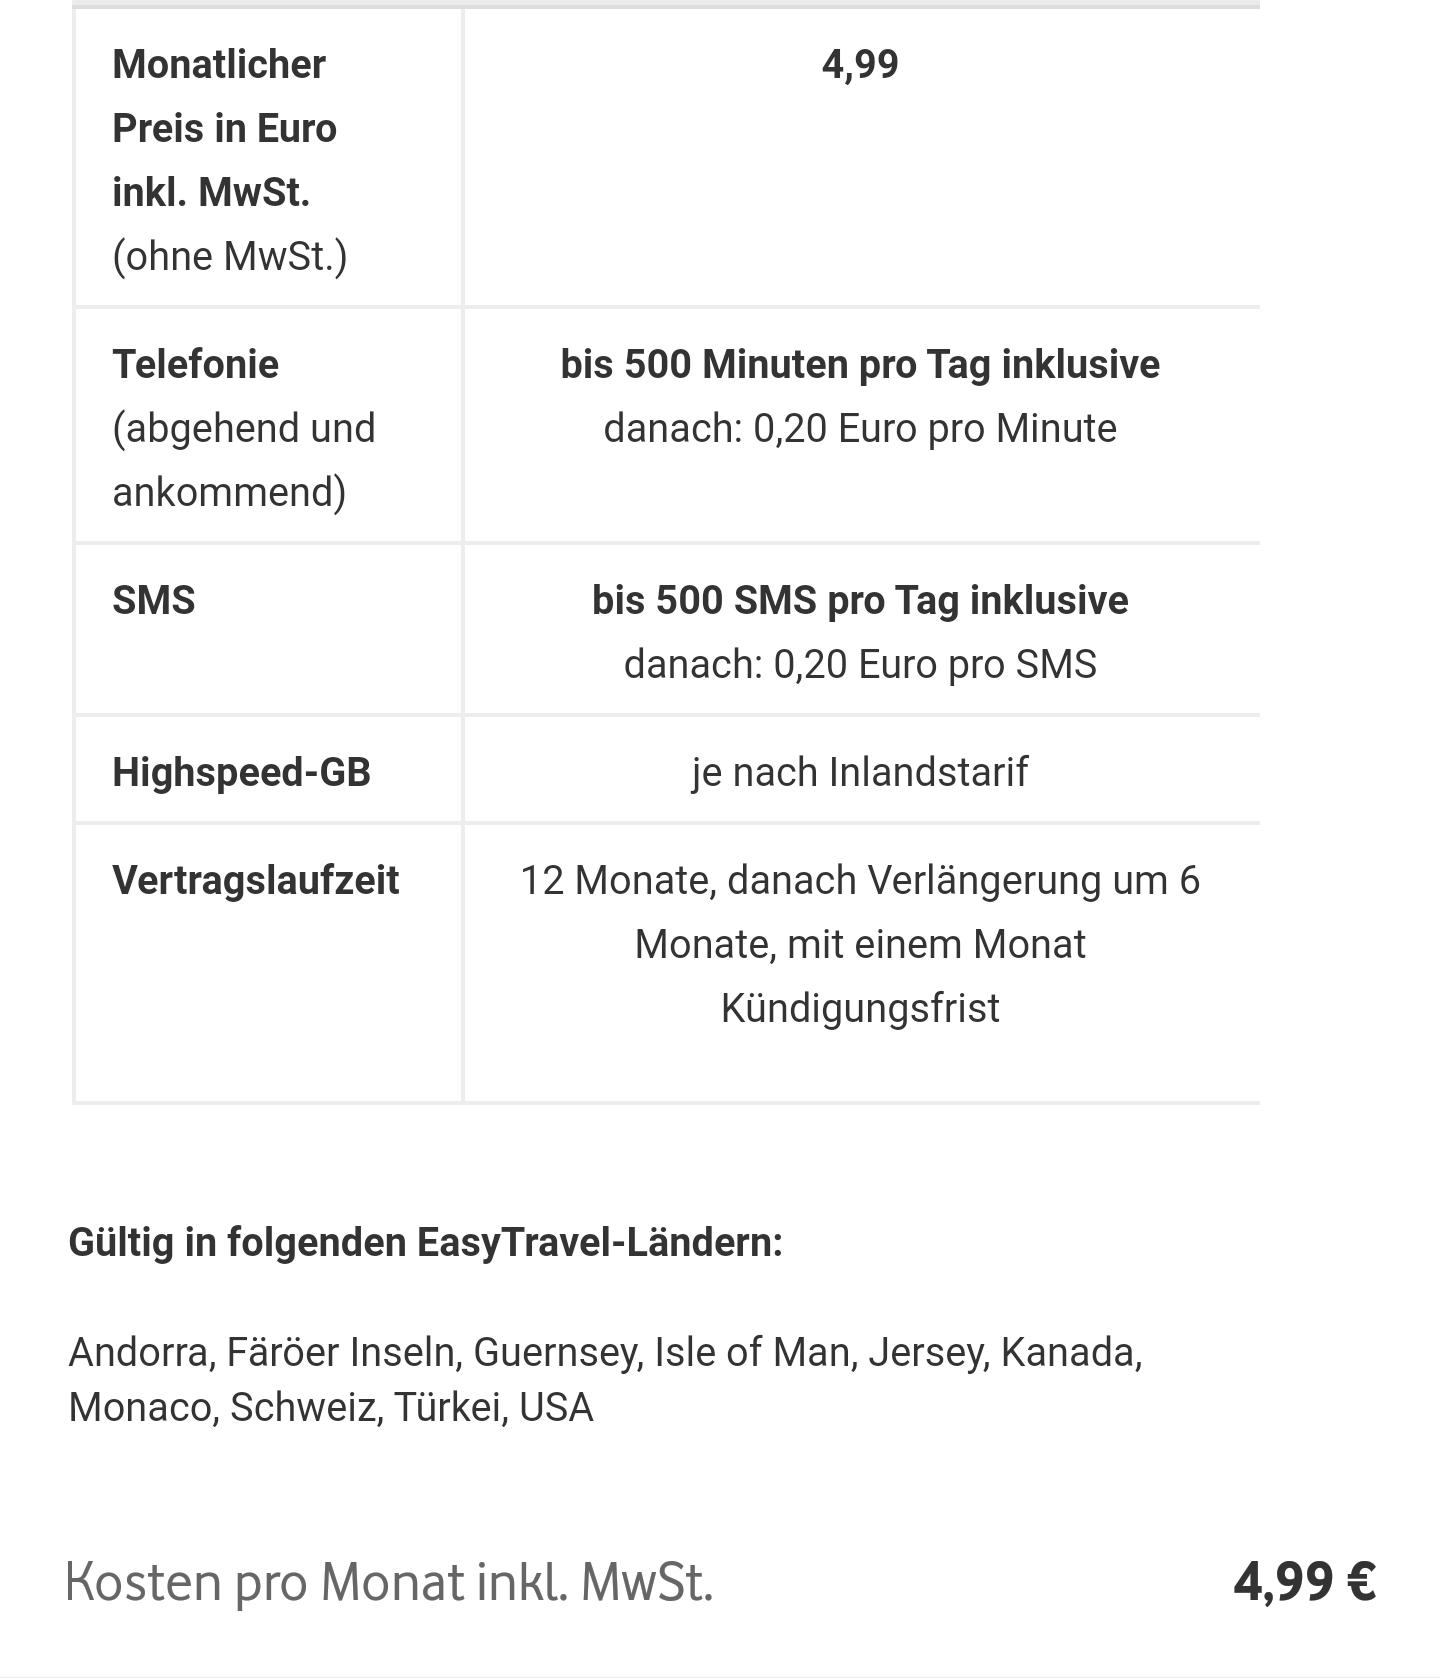 Vodafone Easy Travel Flat wieder verfügbar (USA, Schweiz, Türkei, ...)